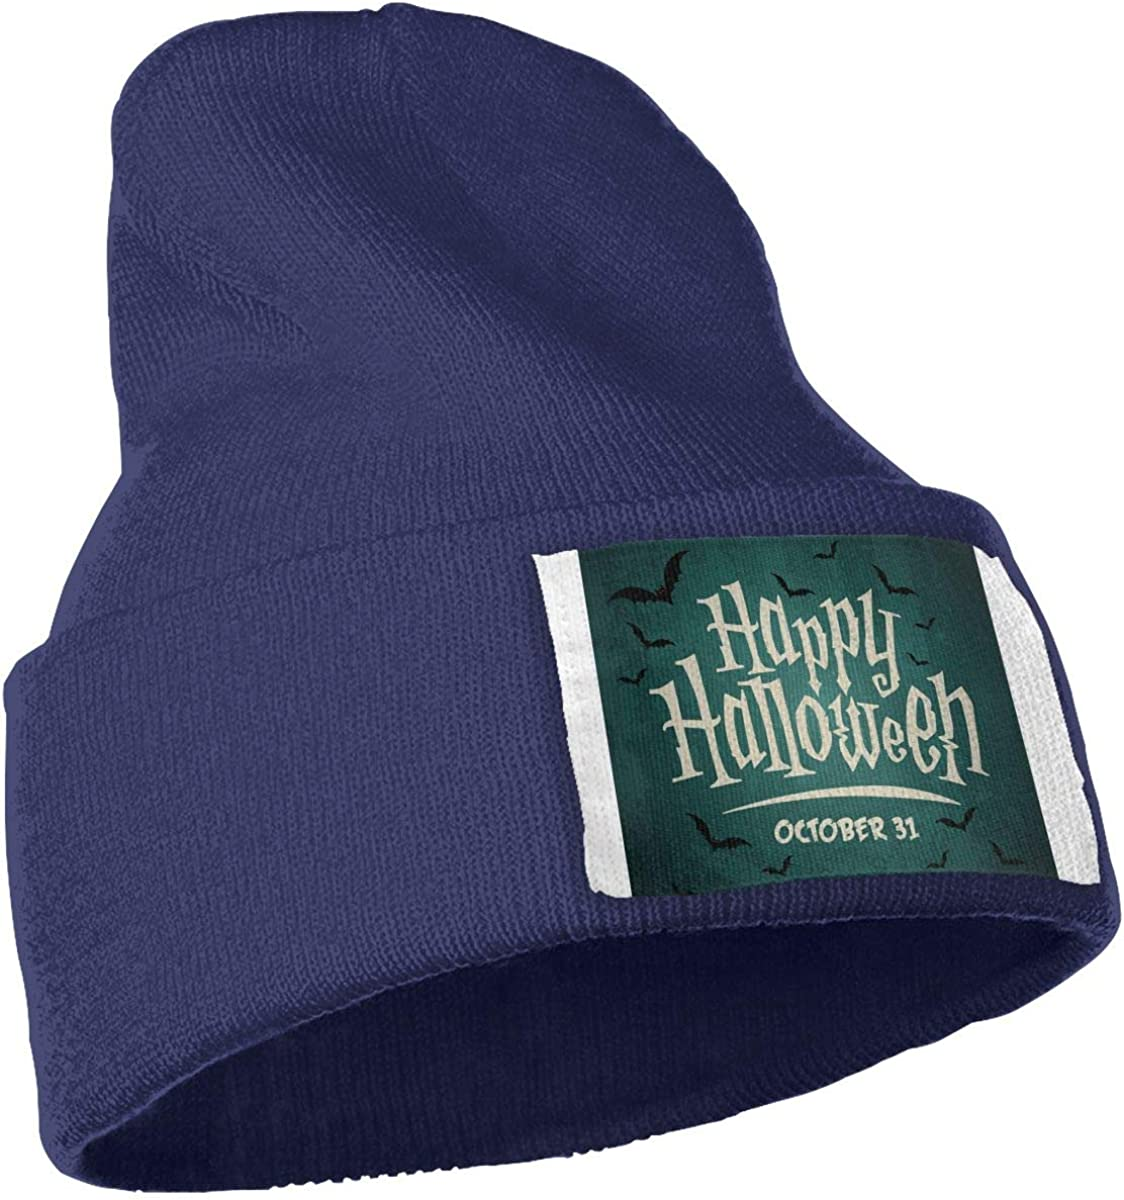 Halloween October 31 Beanie Cap Hat Men /& Women Knitting Hats Stretchy /& Soft Beanie